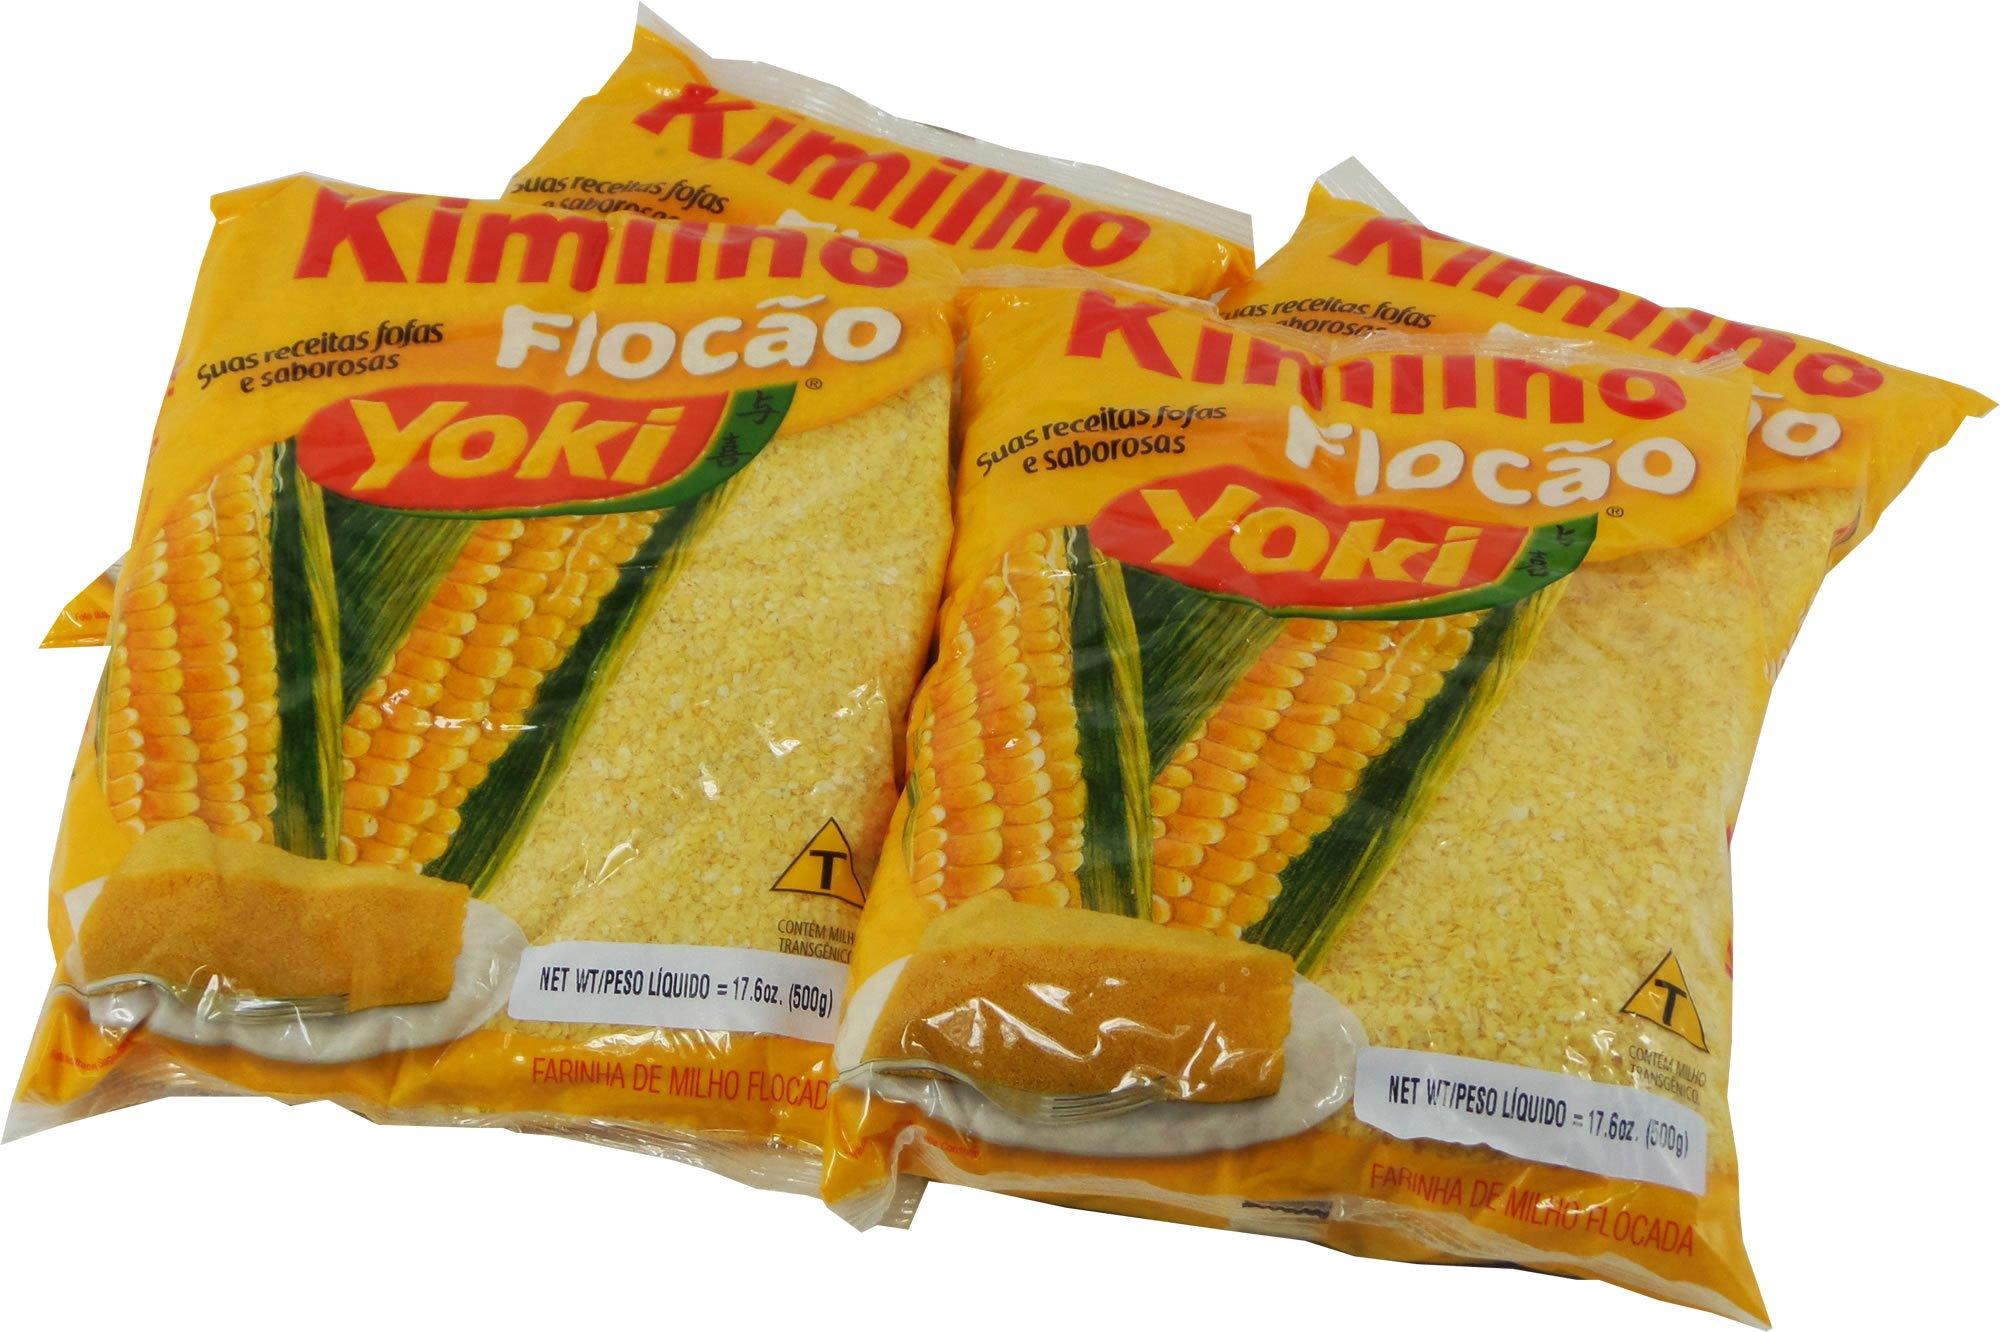 Yoki - Kimilho - Pre-Cooked Flocked Corn Meal (PACK OF 04)   Farinha de Milho Flocada - 500g